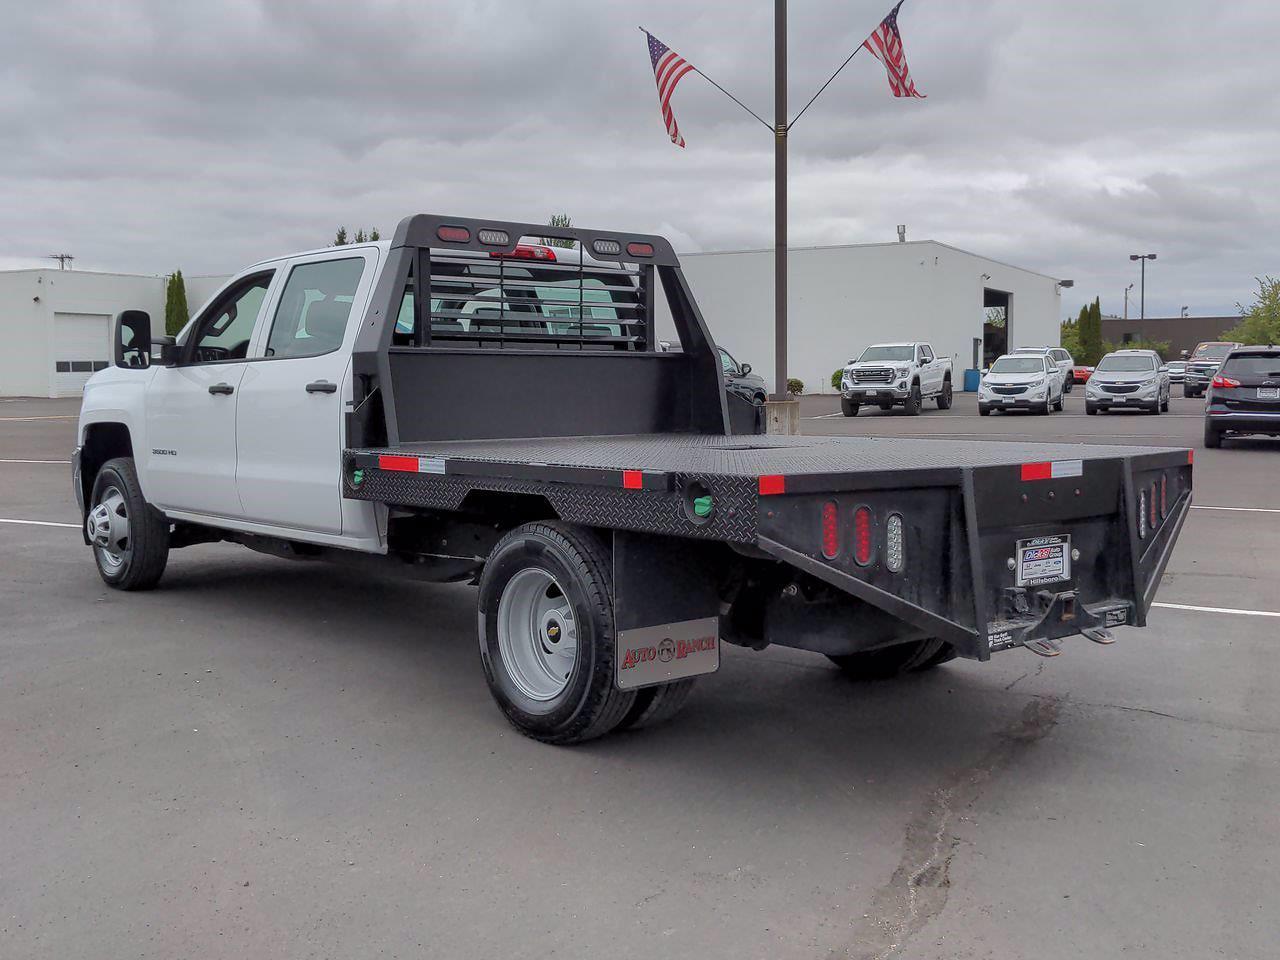 2019 Chevrolet Silverado 3500 Crew Cab DRW 4x4, Platform Body #P14180 - photo 1